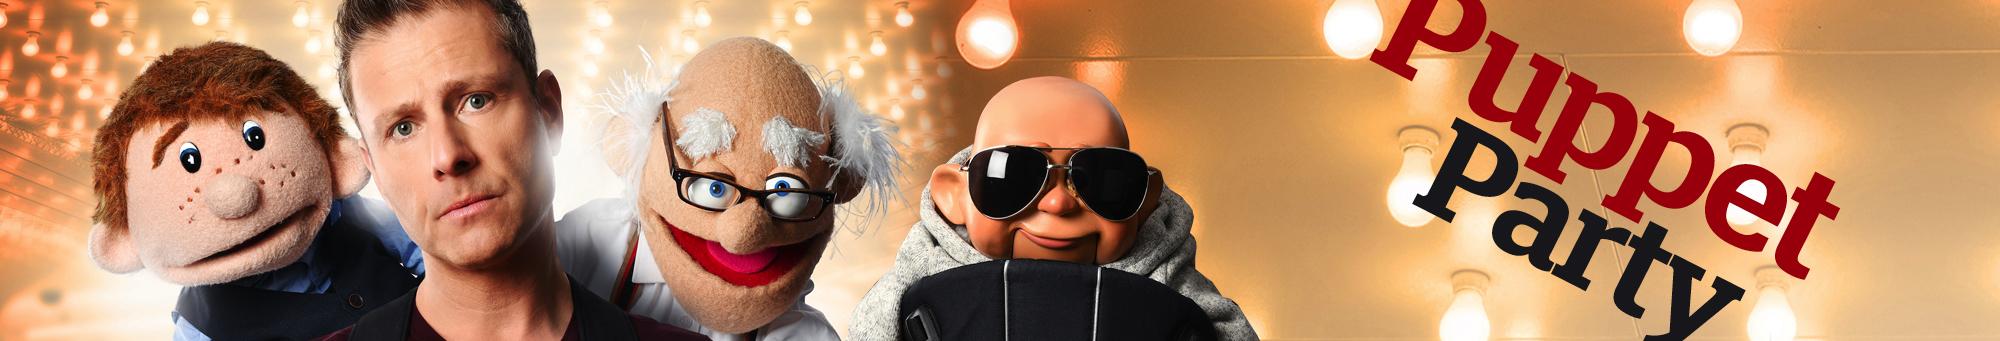 Paul Zerdin -Masthead-Puppet Party.jpg